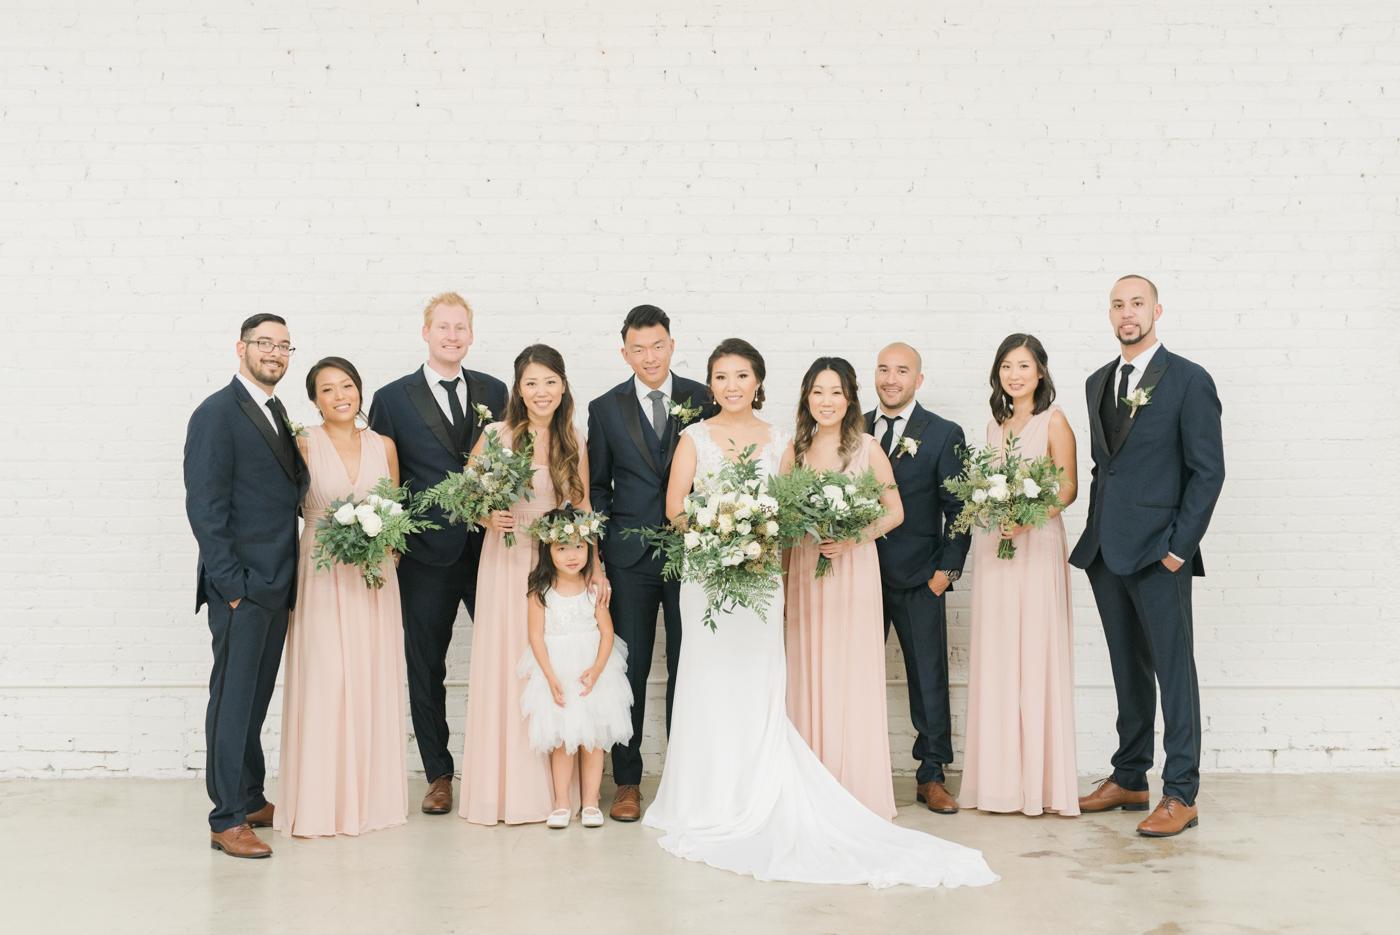 Modern_Wedding_HNYPT_Honeypot_LA_Photographer_Los_Angeles-12.jpg